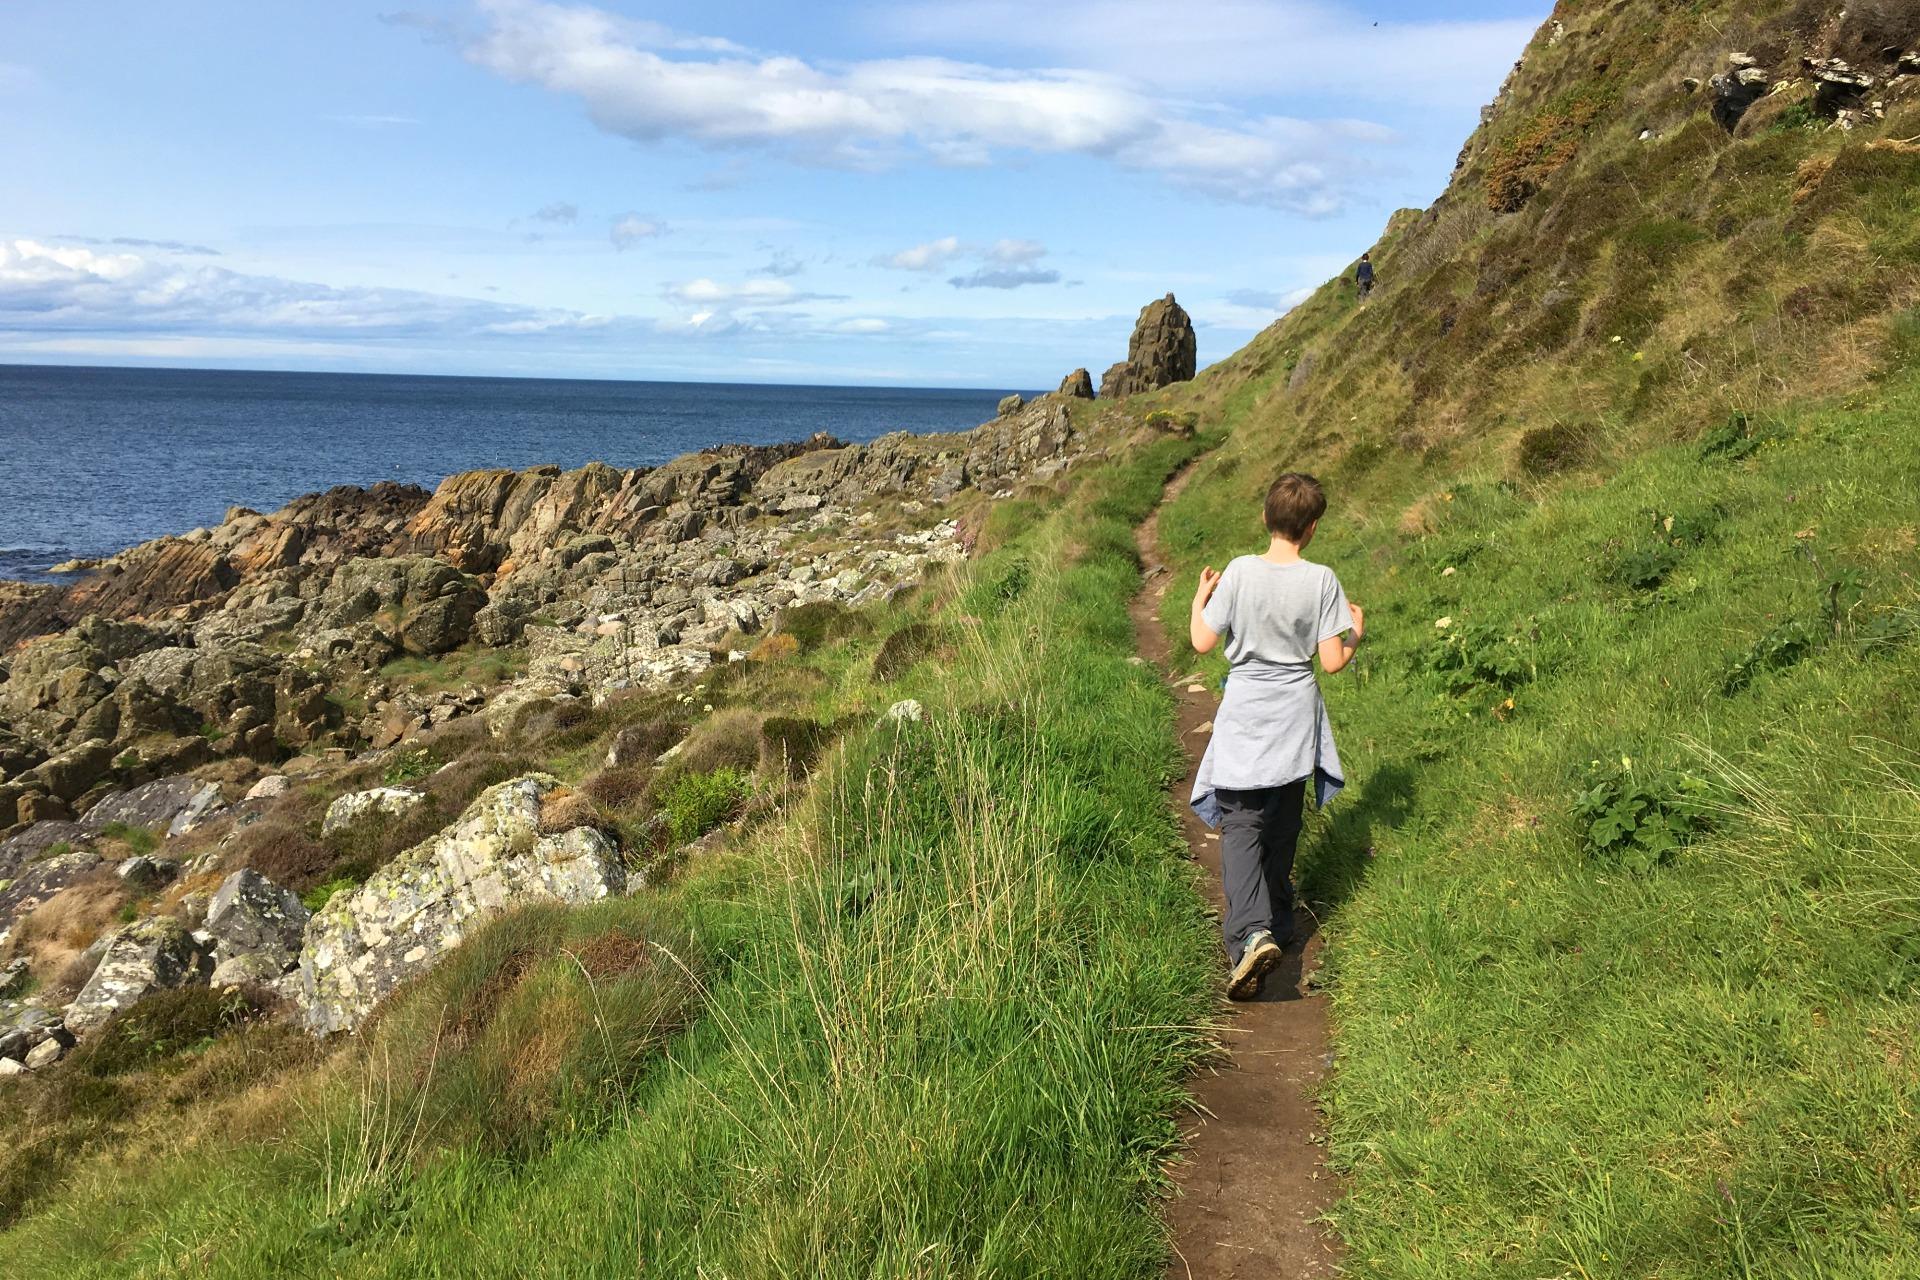 hiking in Scotland along the Moray Coast Trail